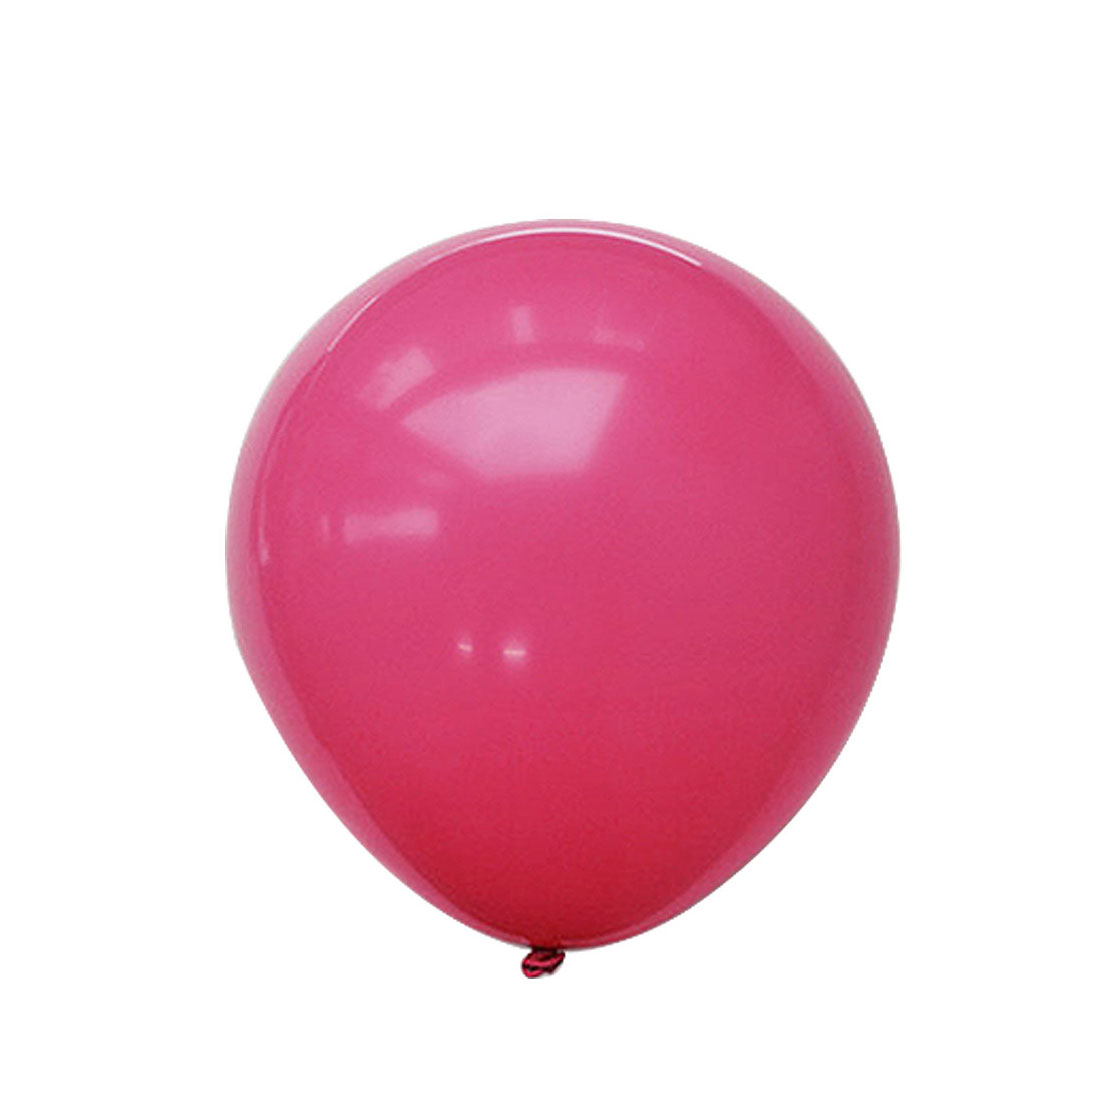 Wedding Birthday Party Latex Round Shape Decoration Favor Balloon Shocking Pink 36 Inch